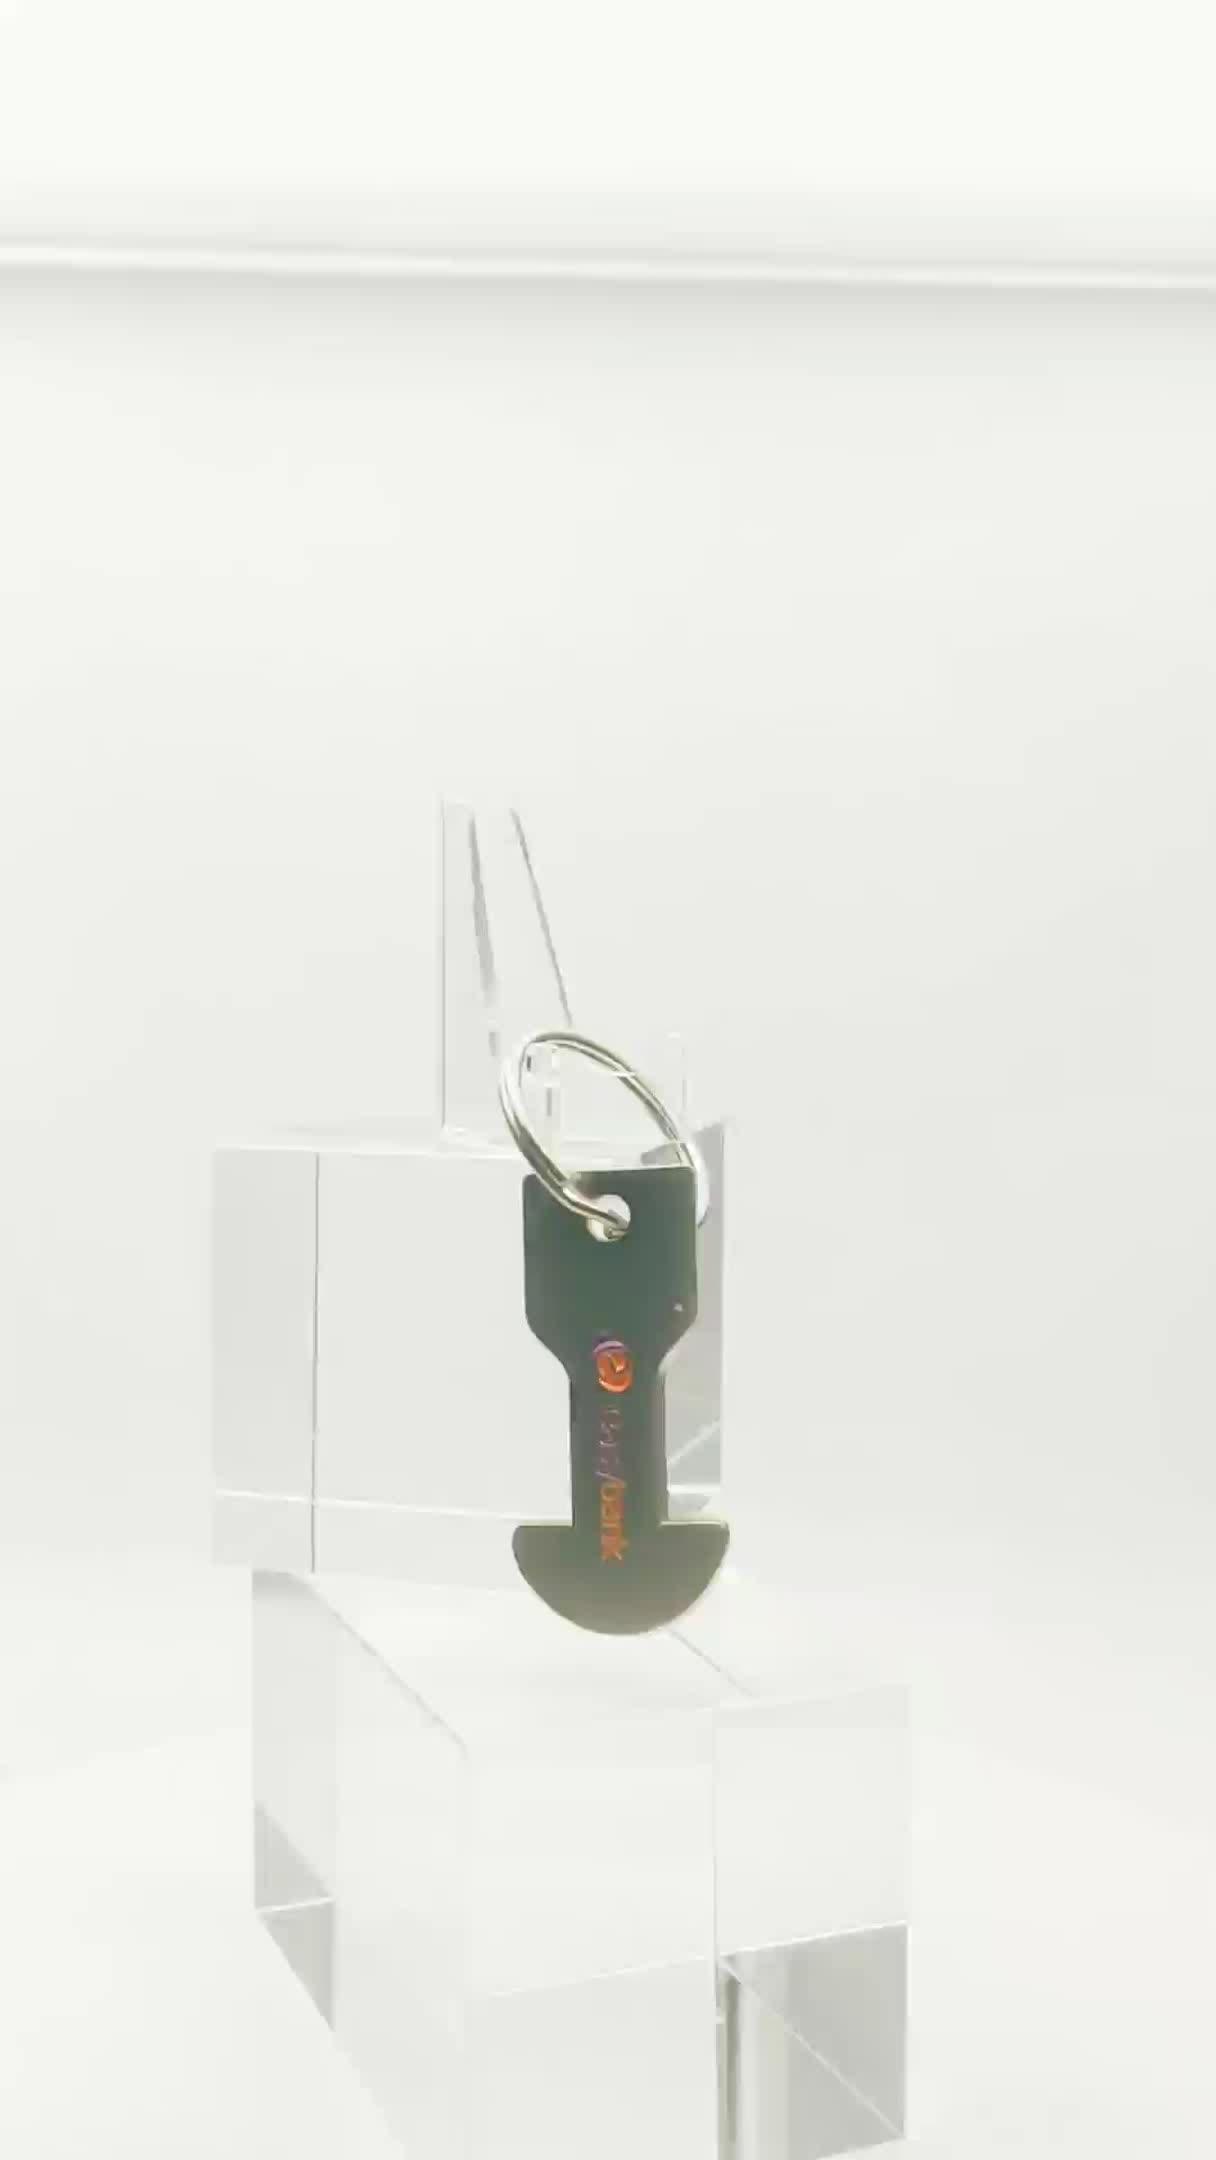 Personalizado keychain do pvc artgifts lembrança 3D personalizado keyring silicon keychain anel de metal macio pvc keychain para telefone / saco